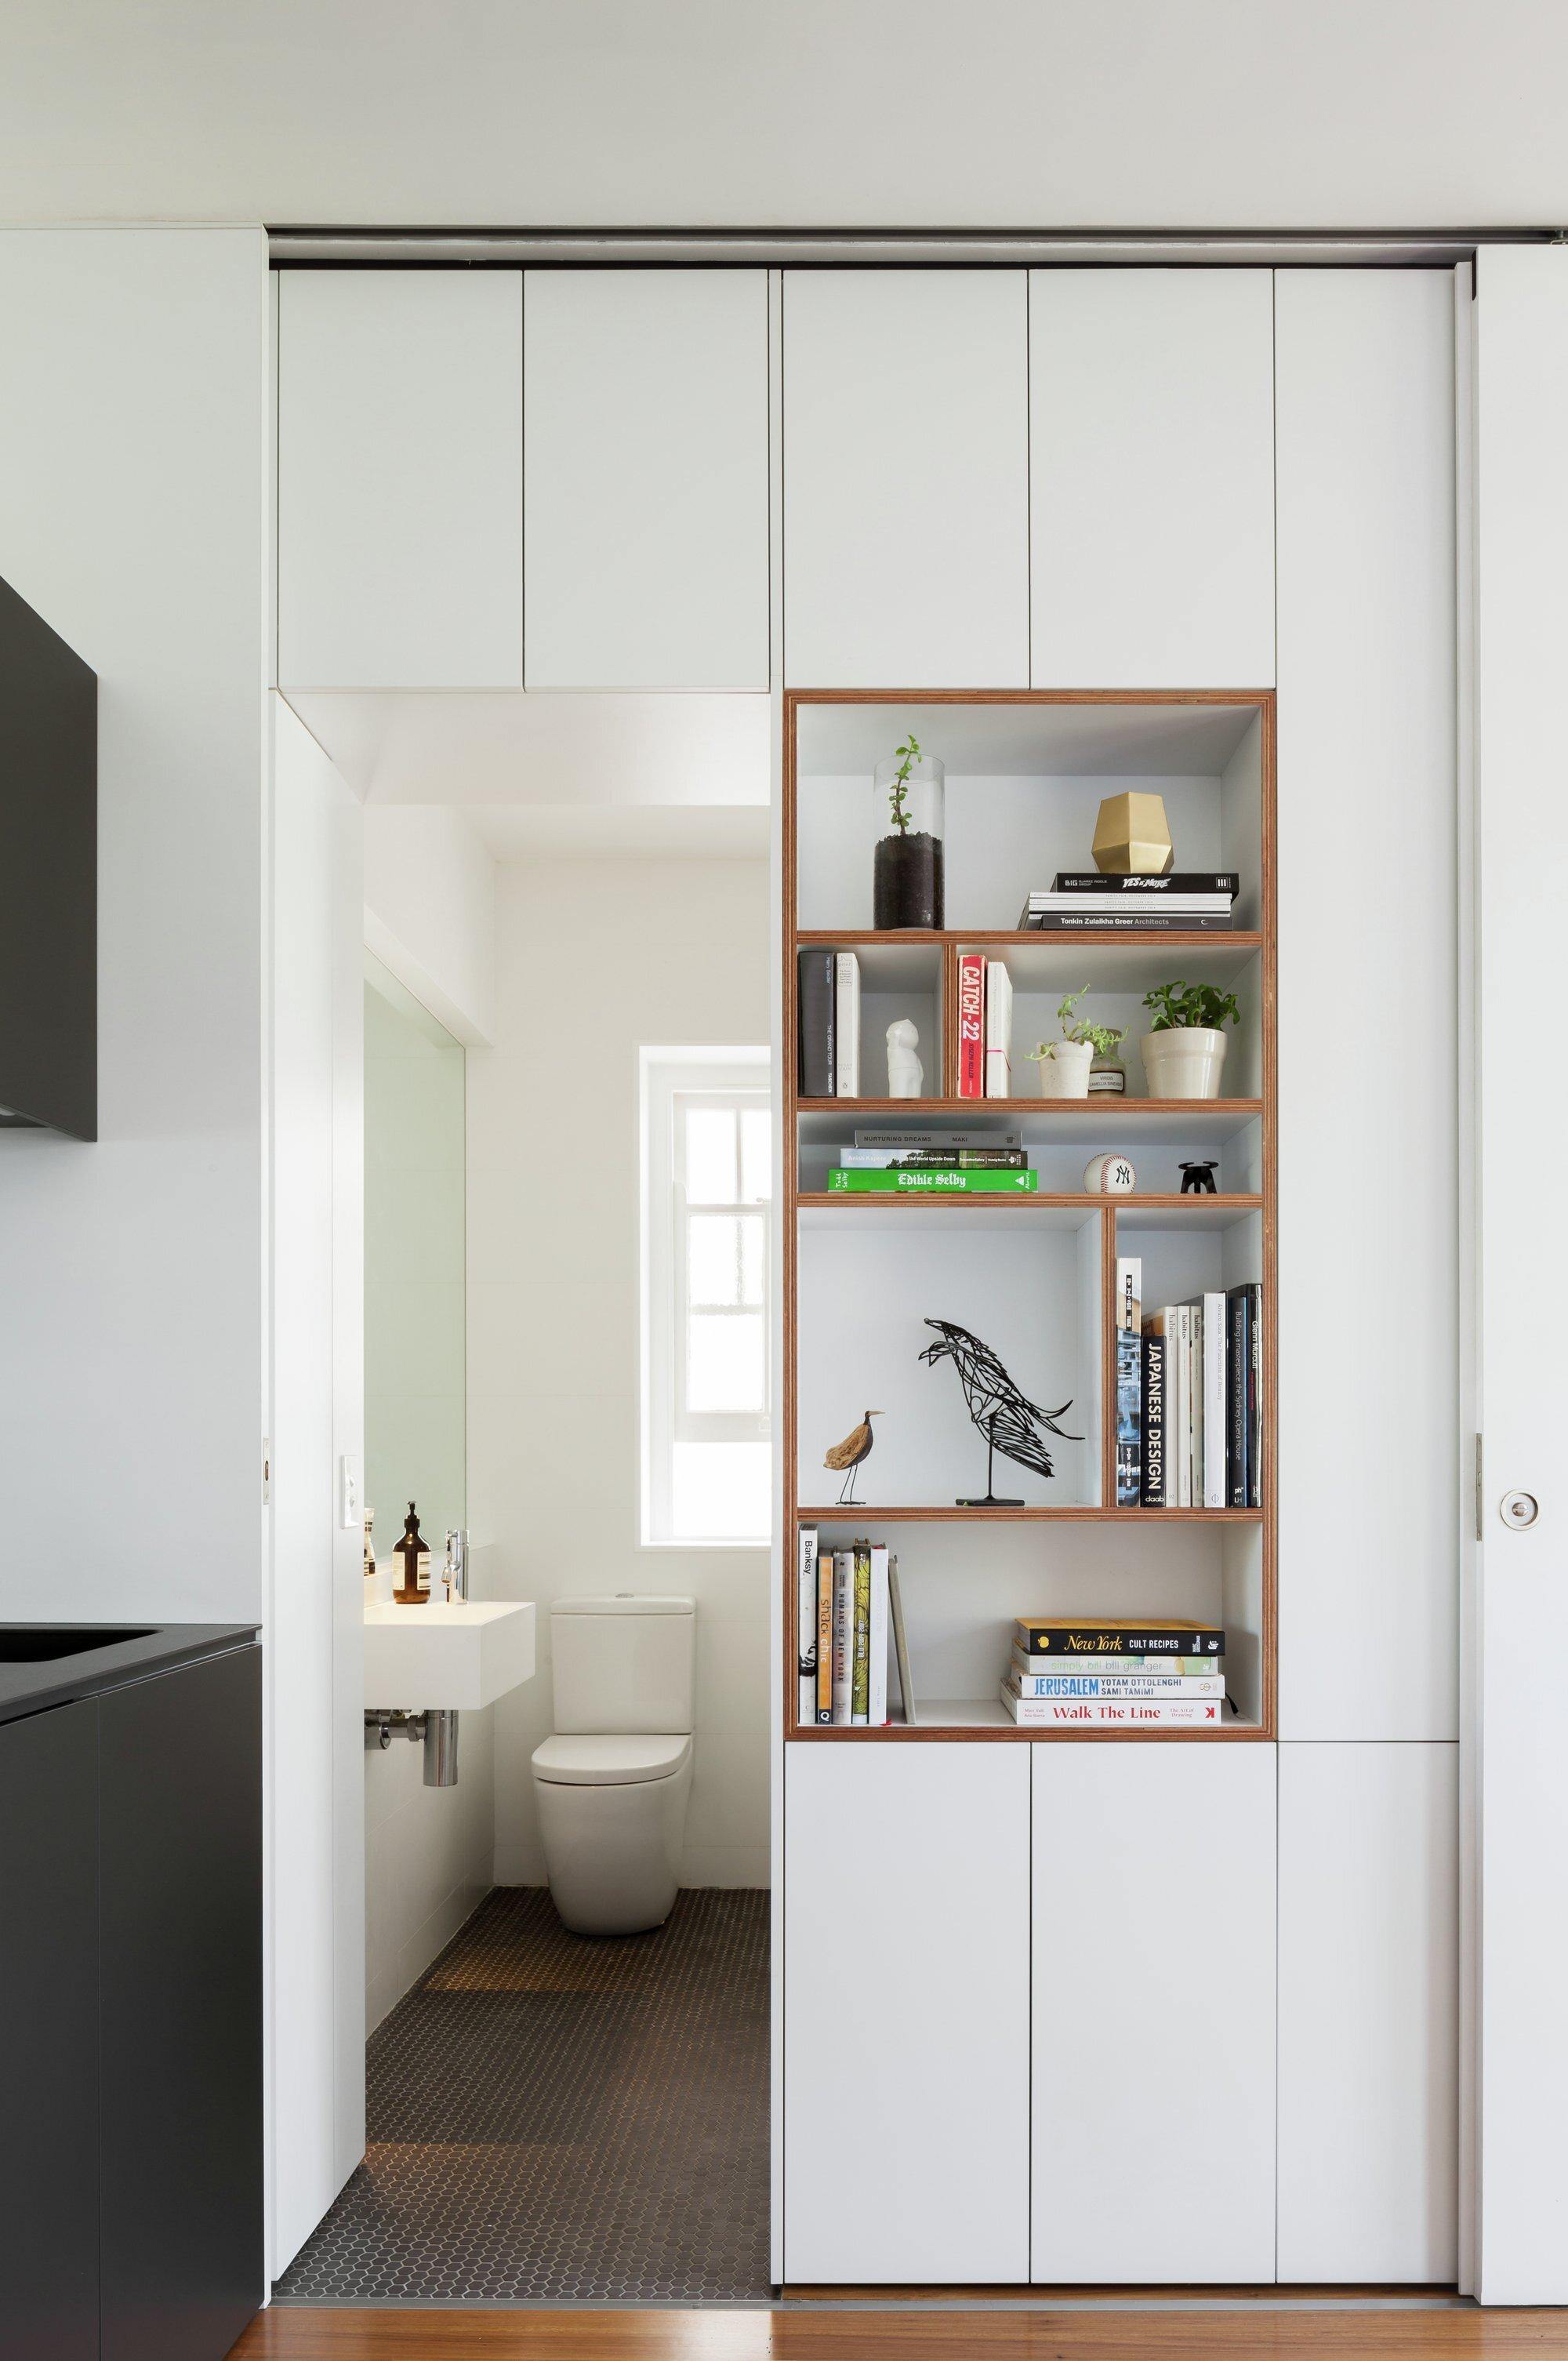 Darlinghurst Apartment - Tiny Apartment - Brad Swartz Architect - Australia - Bathroom - Humble Homes